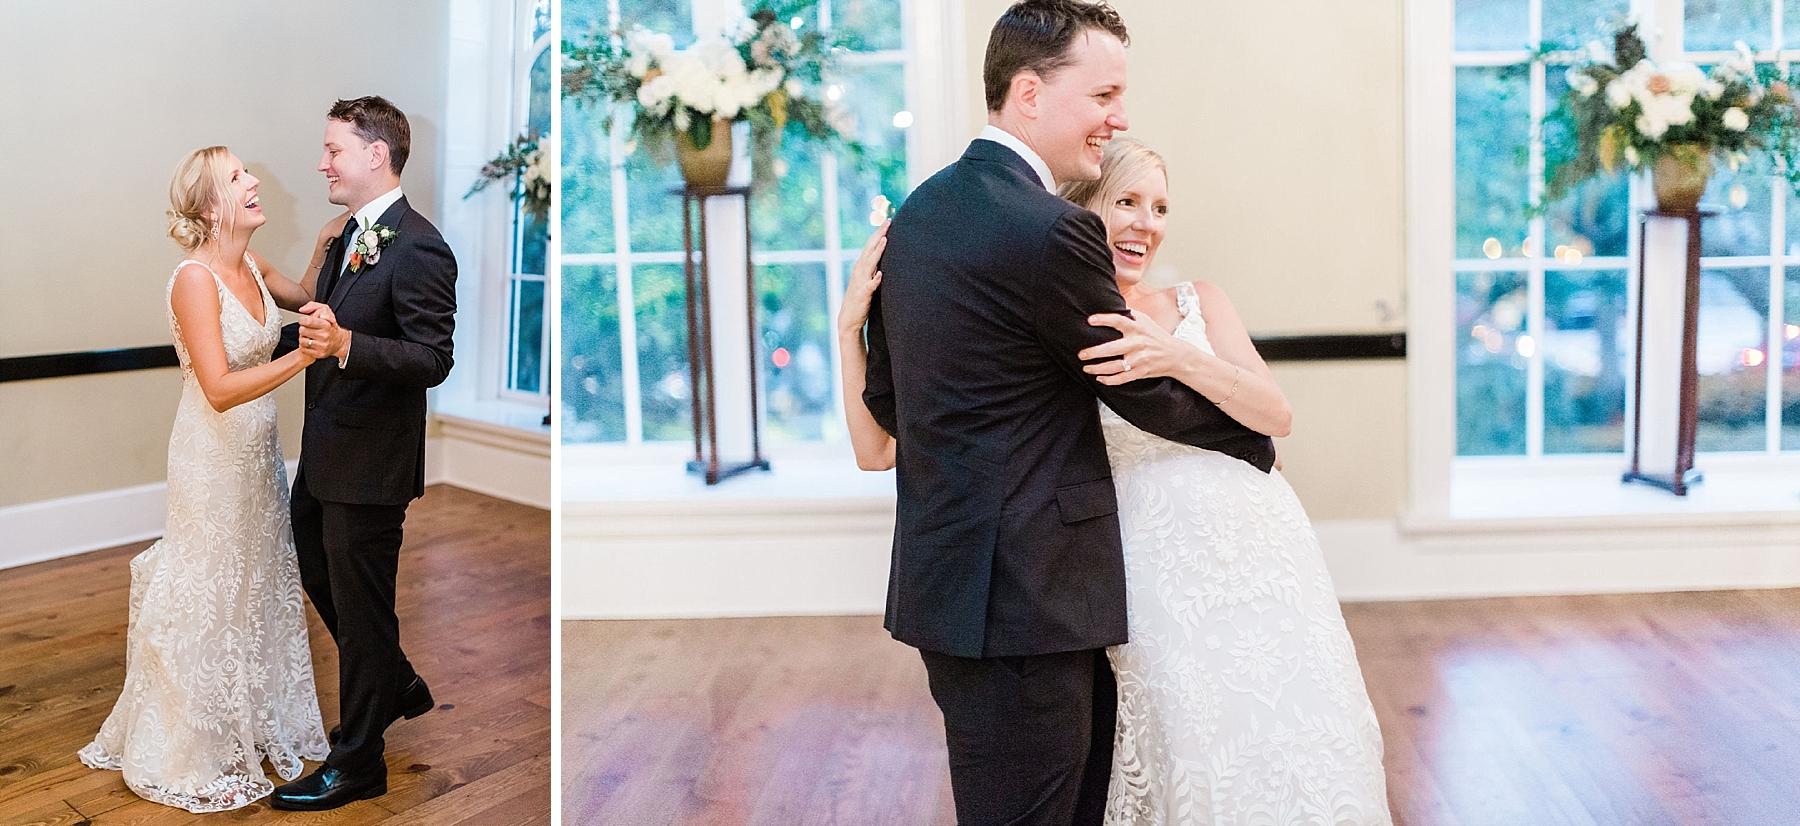 Cara + Matt's Vic's On The River Wedding – Apt. B Photography   Savannah Wedding Photographer